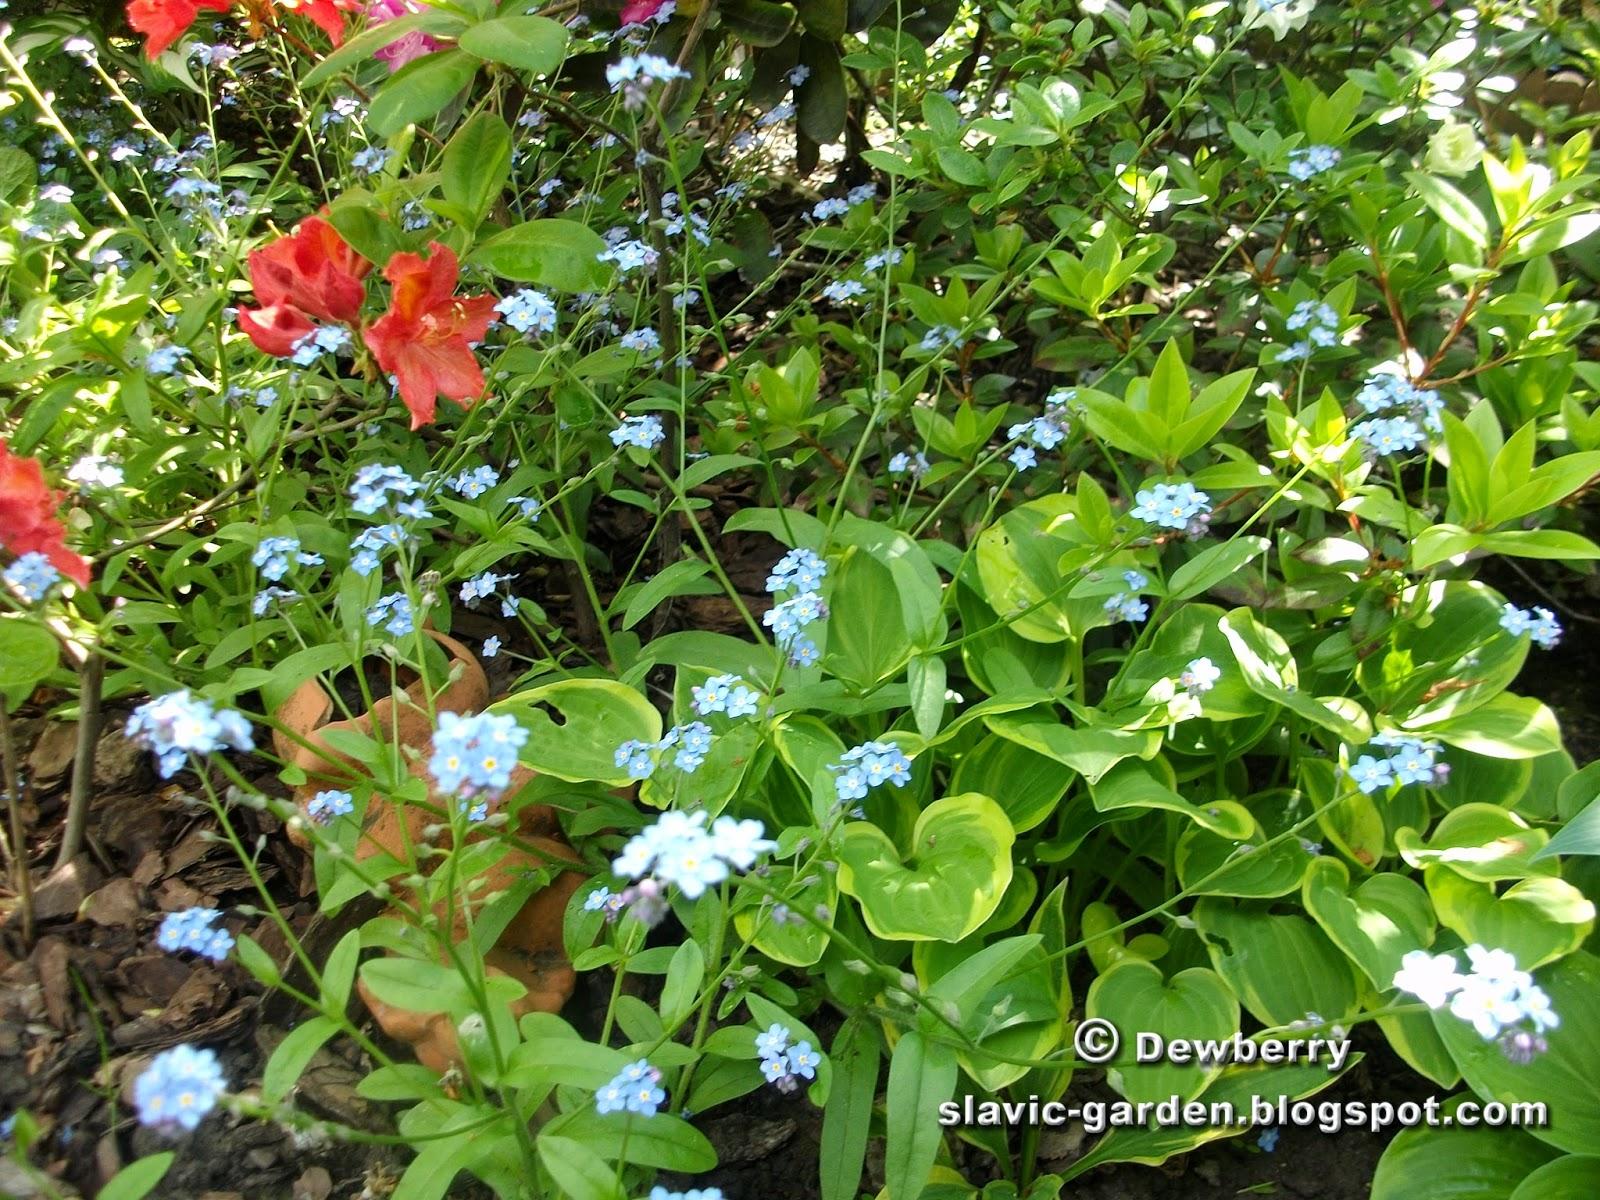 Slavic Garden - Słowiański Ogród: Outdoor beauties ...